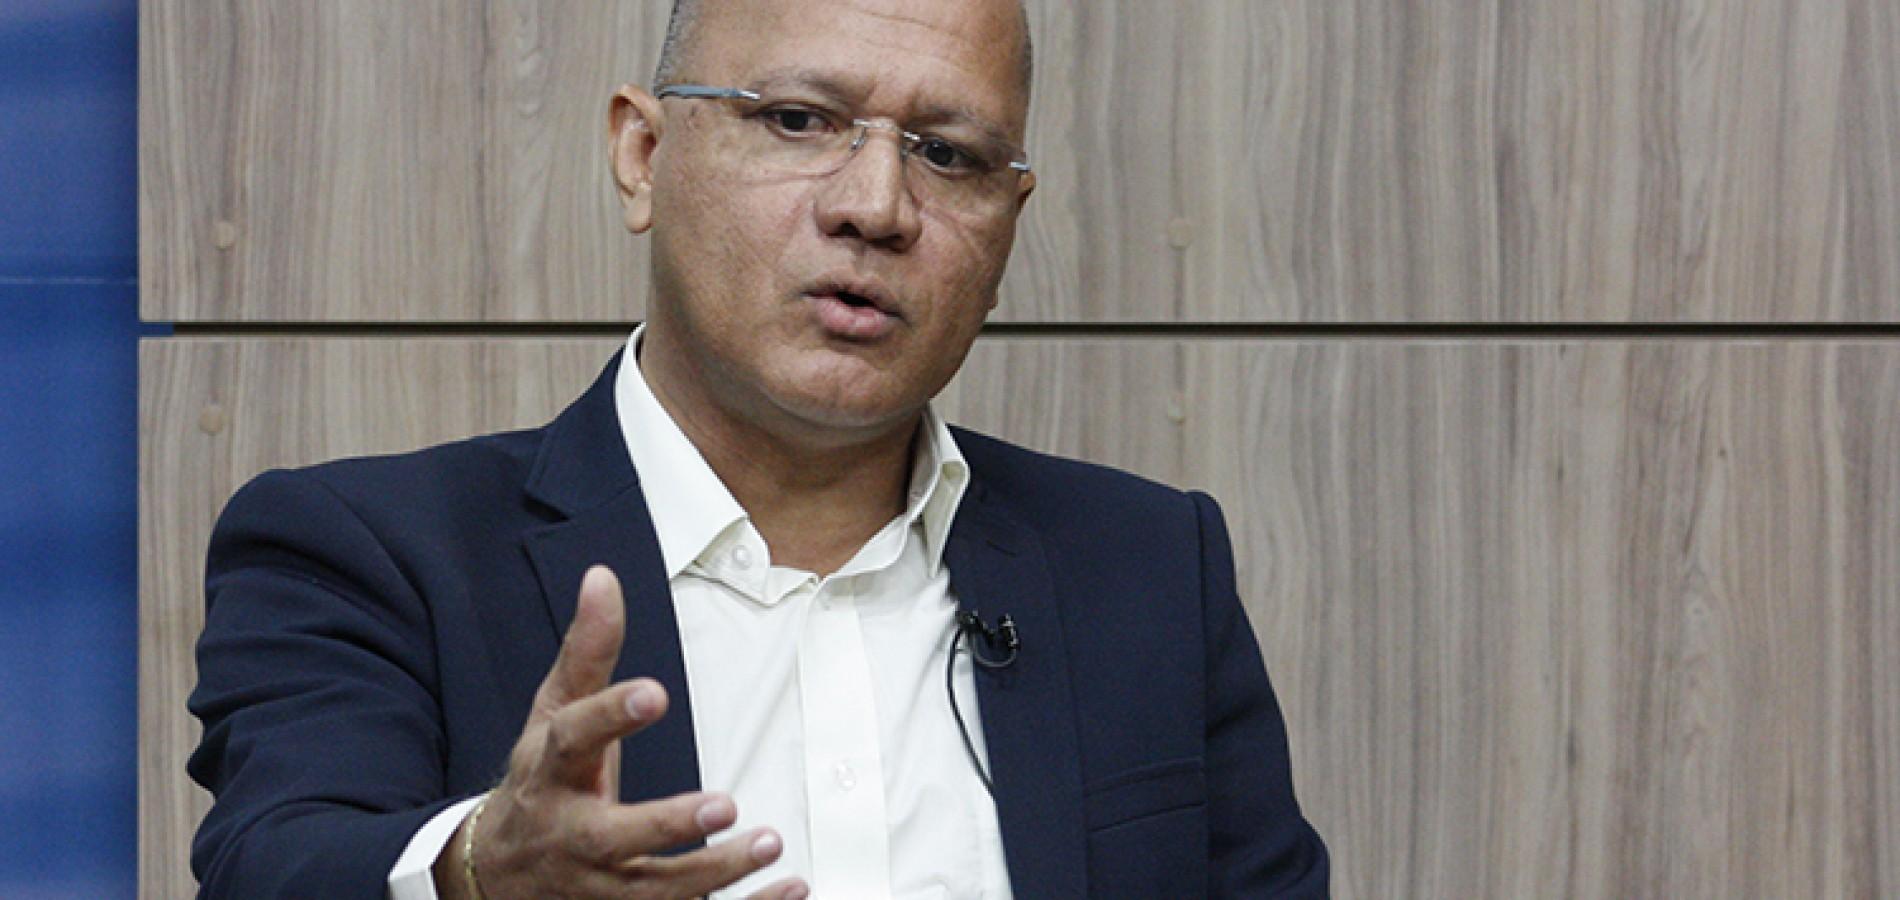 Após 10 anos, governo fará recadastramento de servidores no Piauí